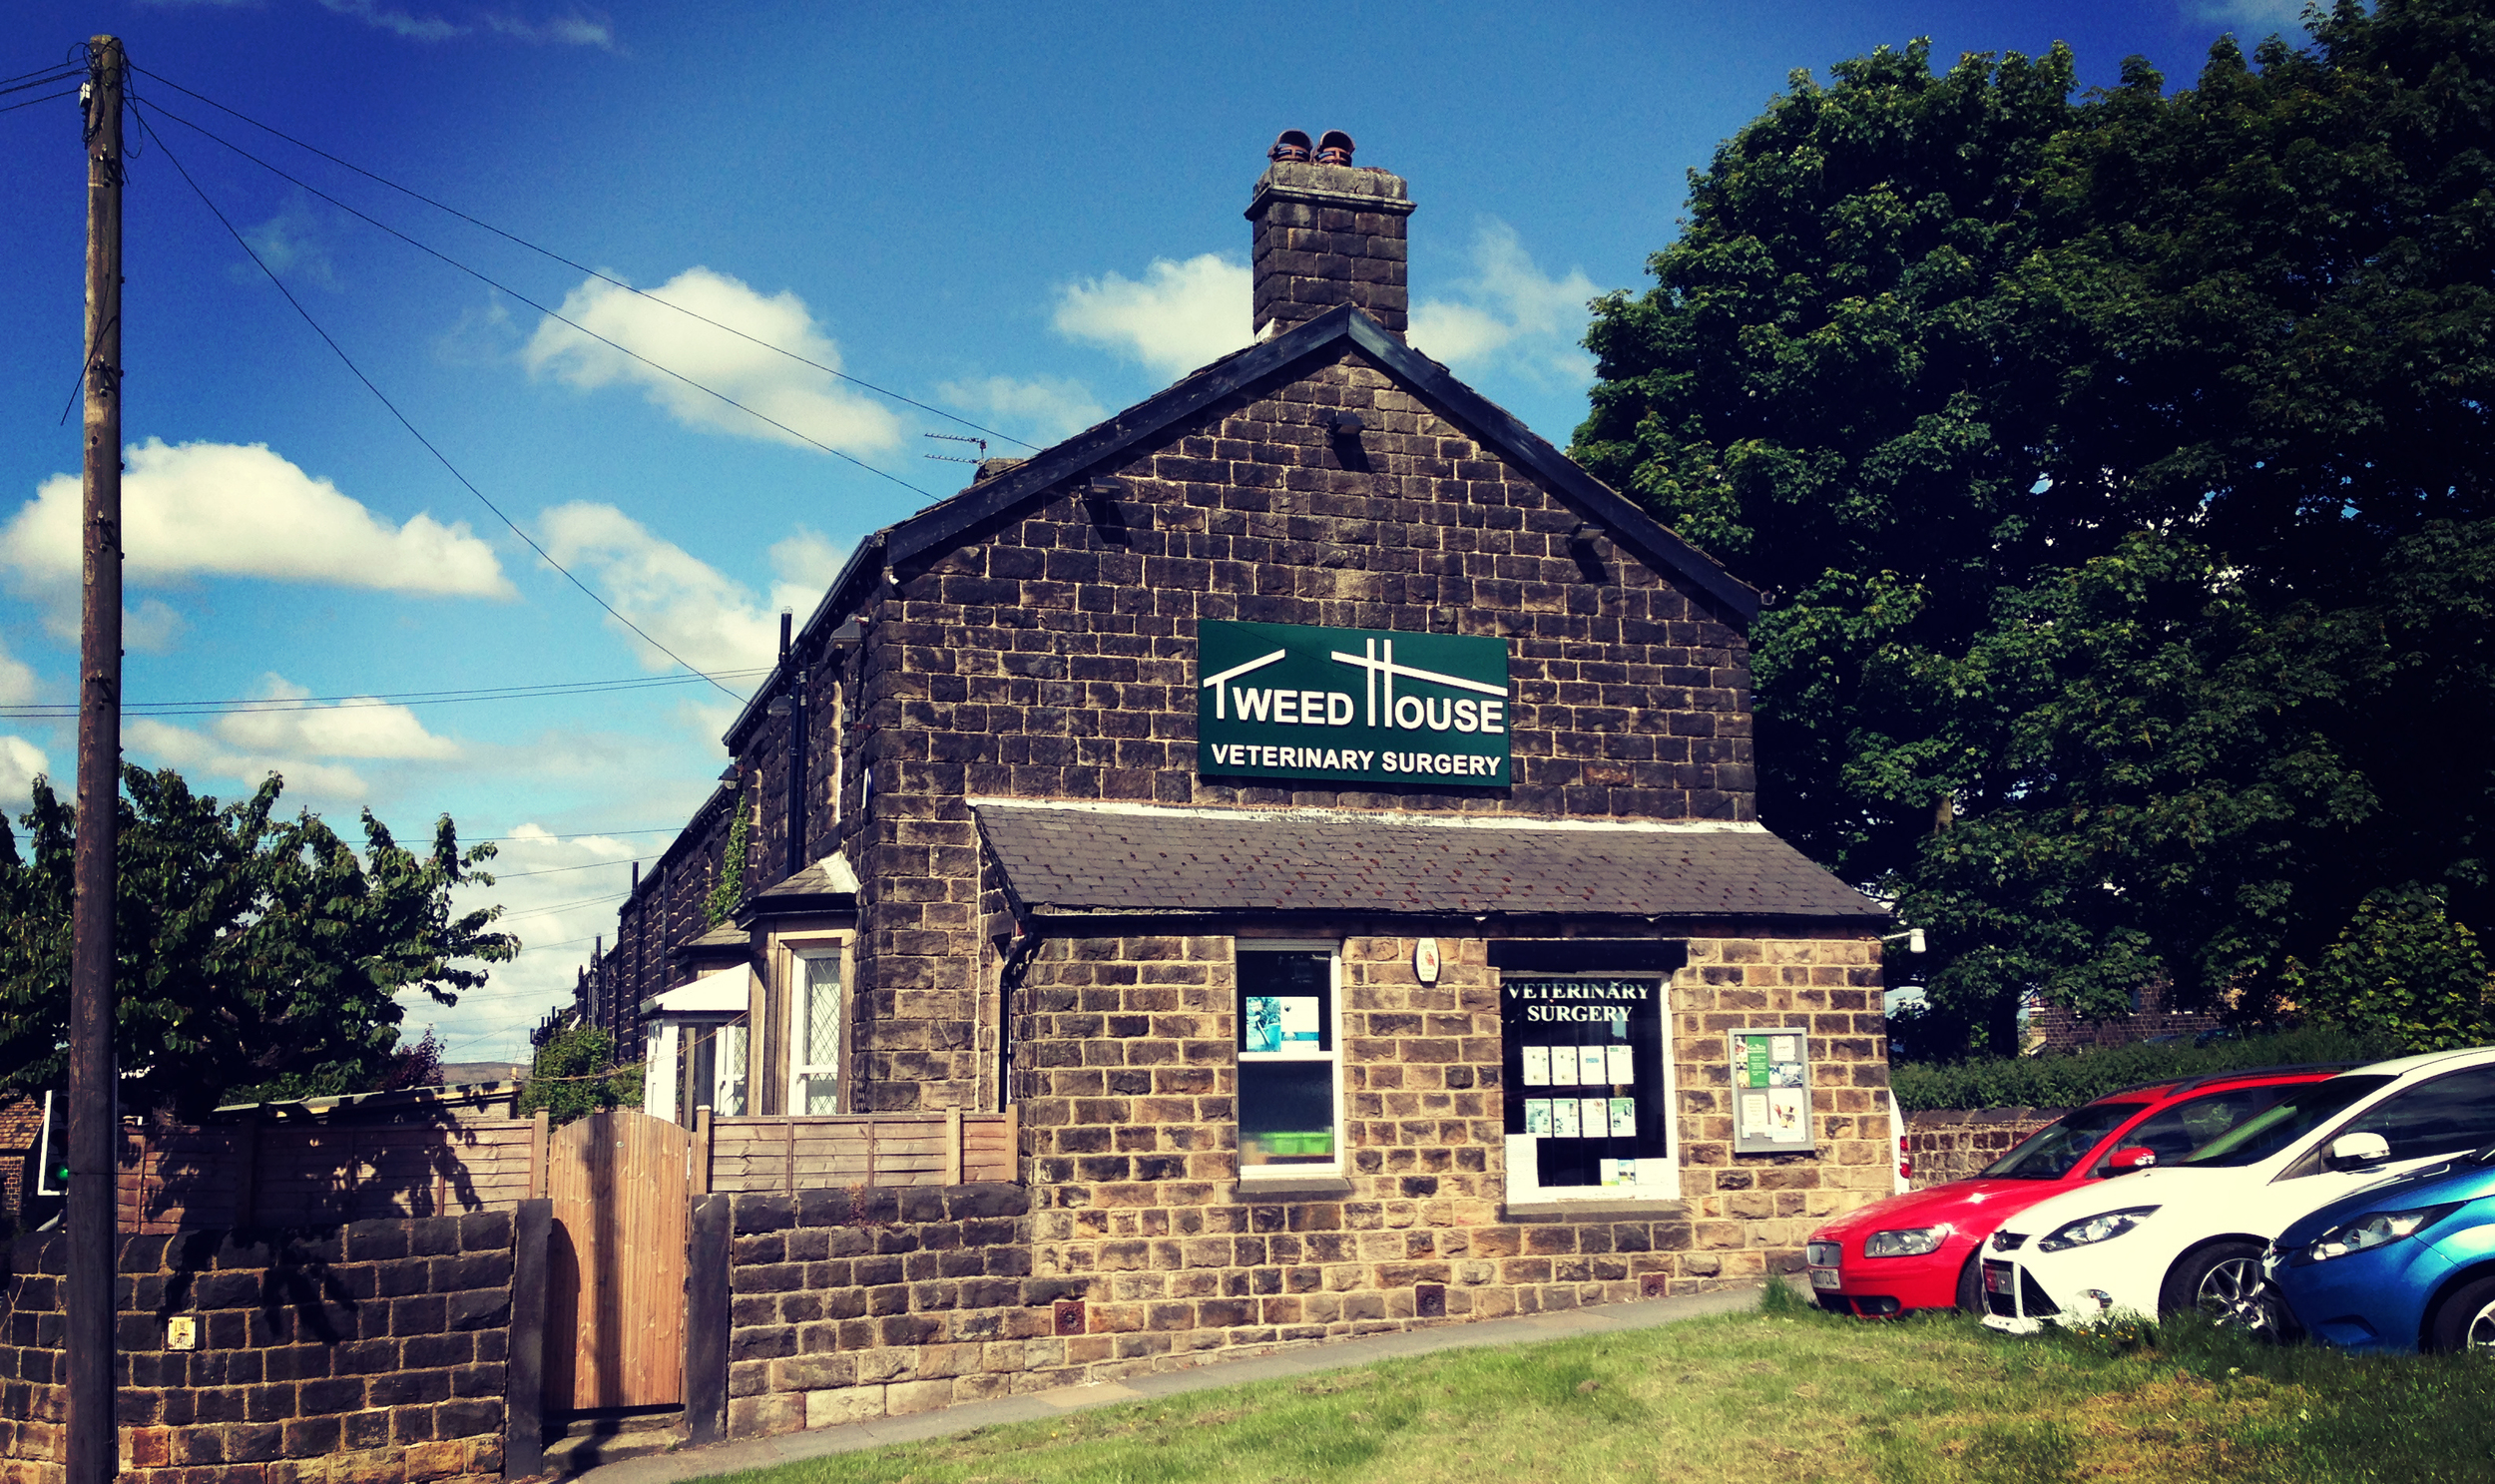 Tweed House, Yeadon